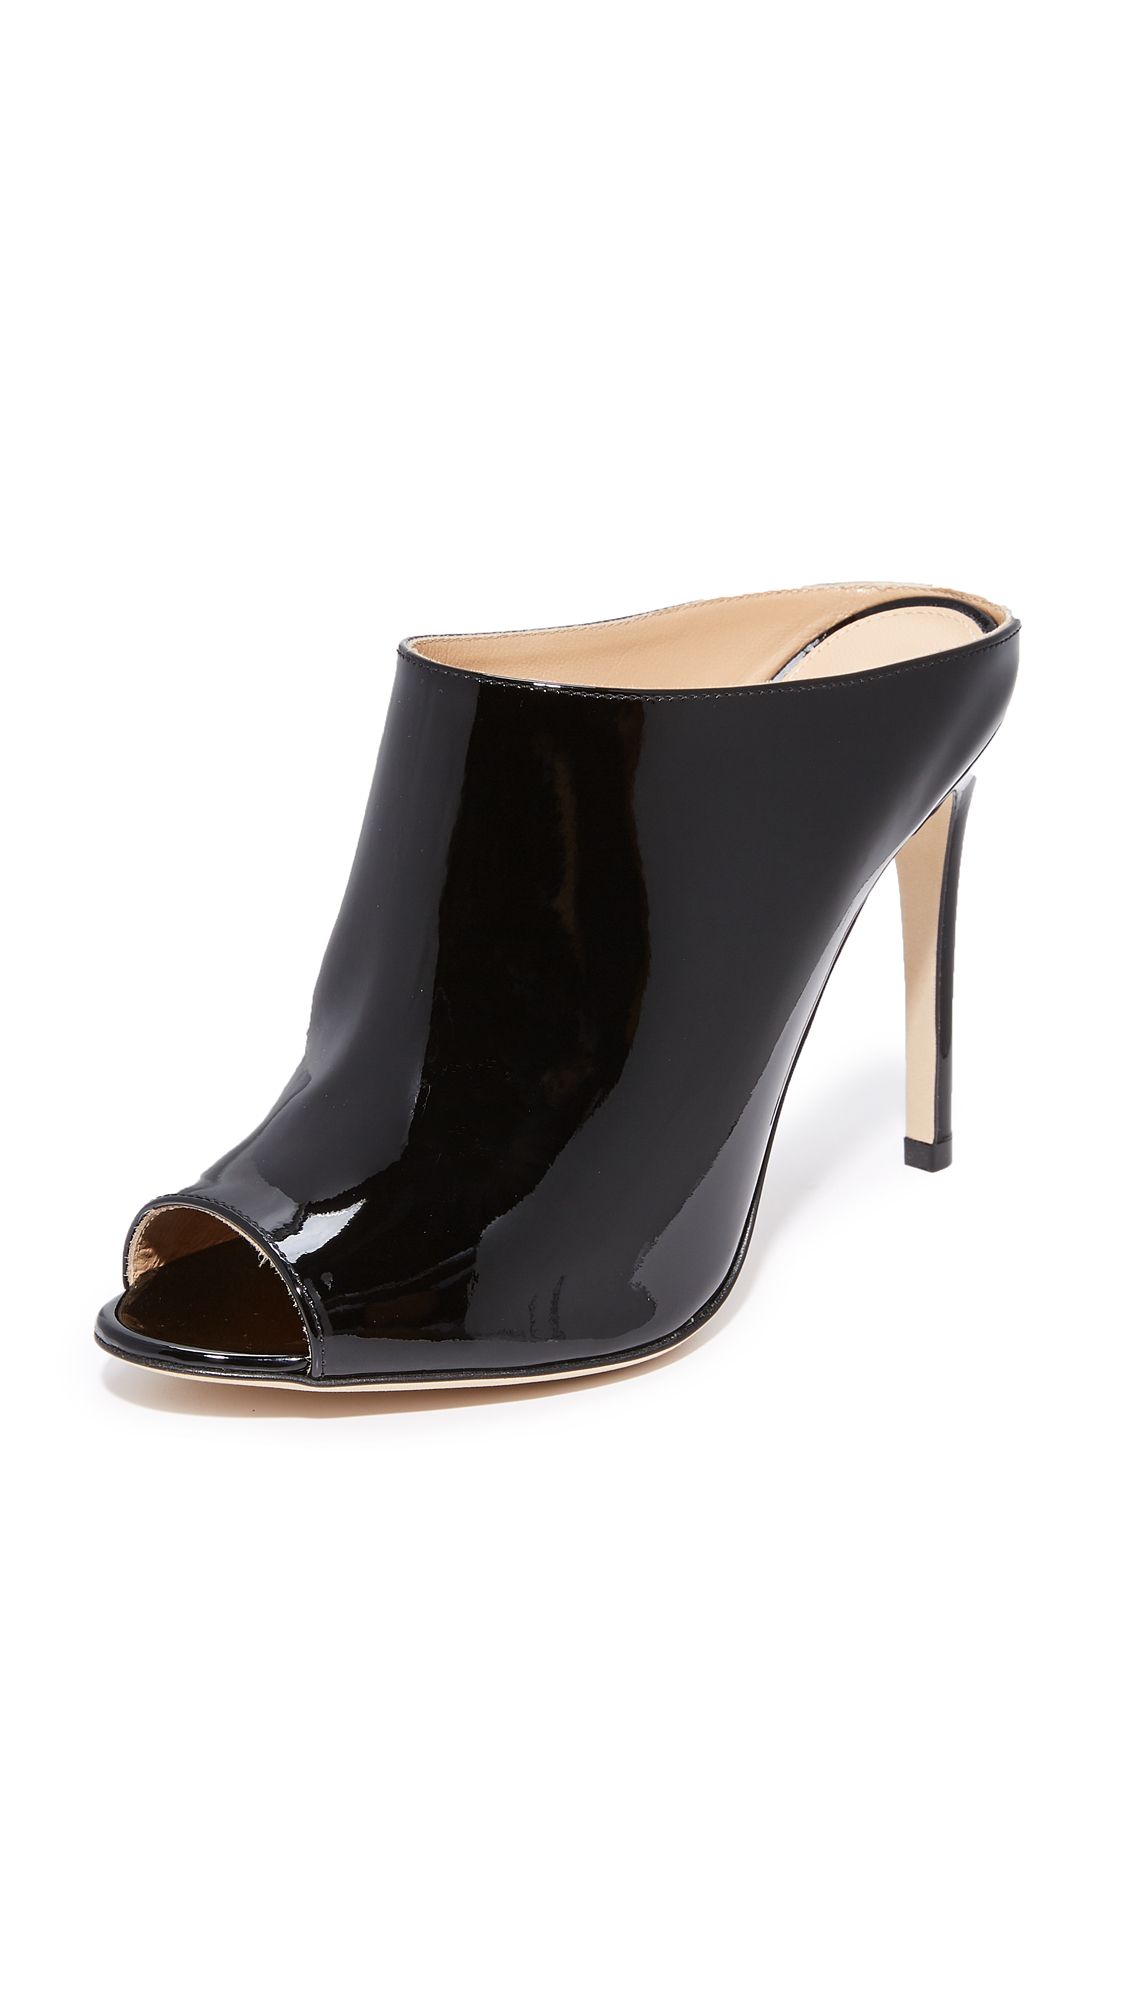 Sergio Rossi Madame Slide Heels - Nero